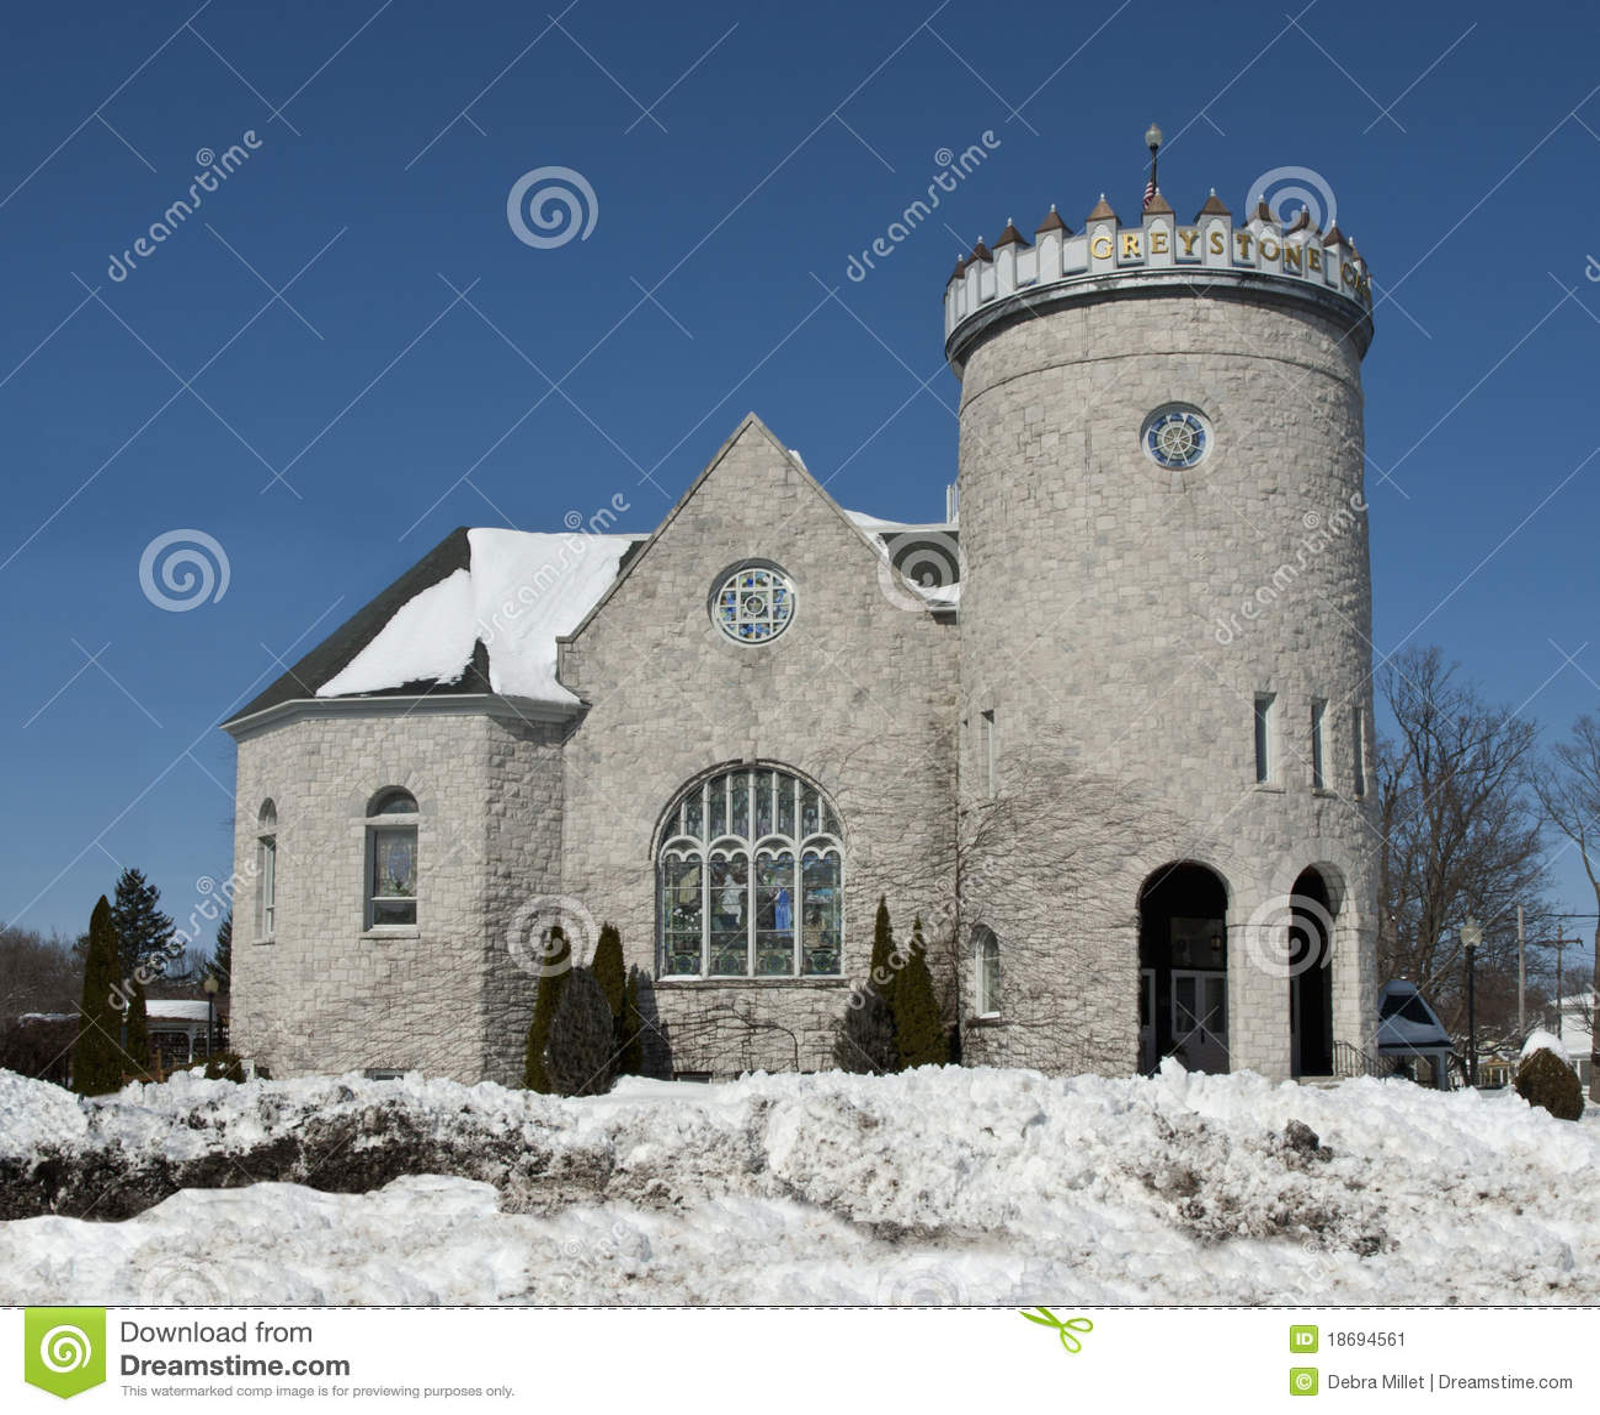 Greystone castle stock image image 18694561 for The greystone